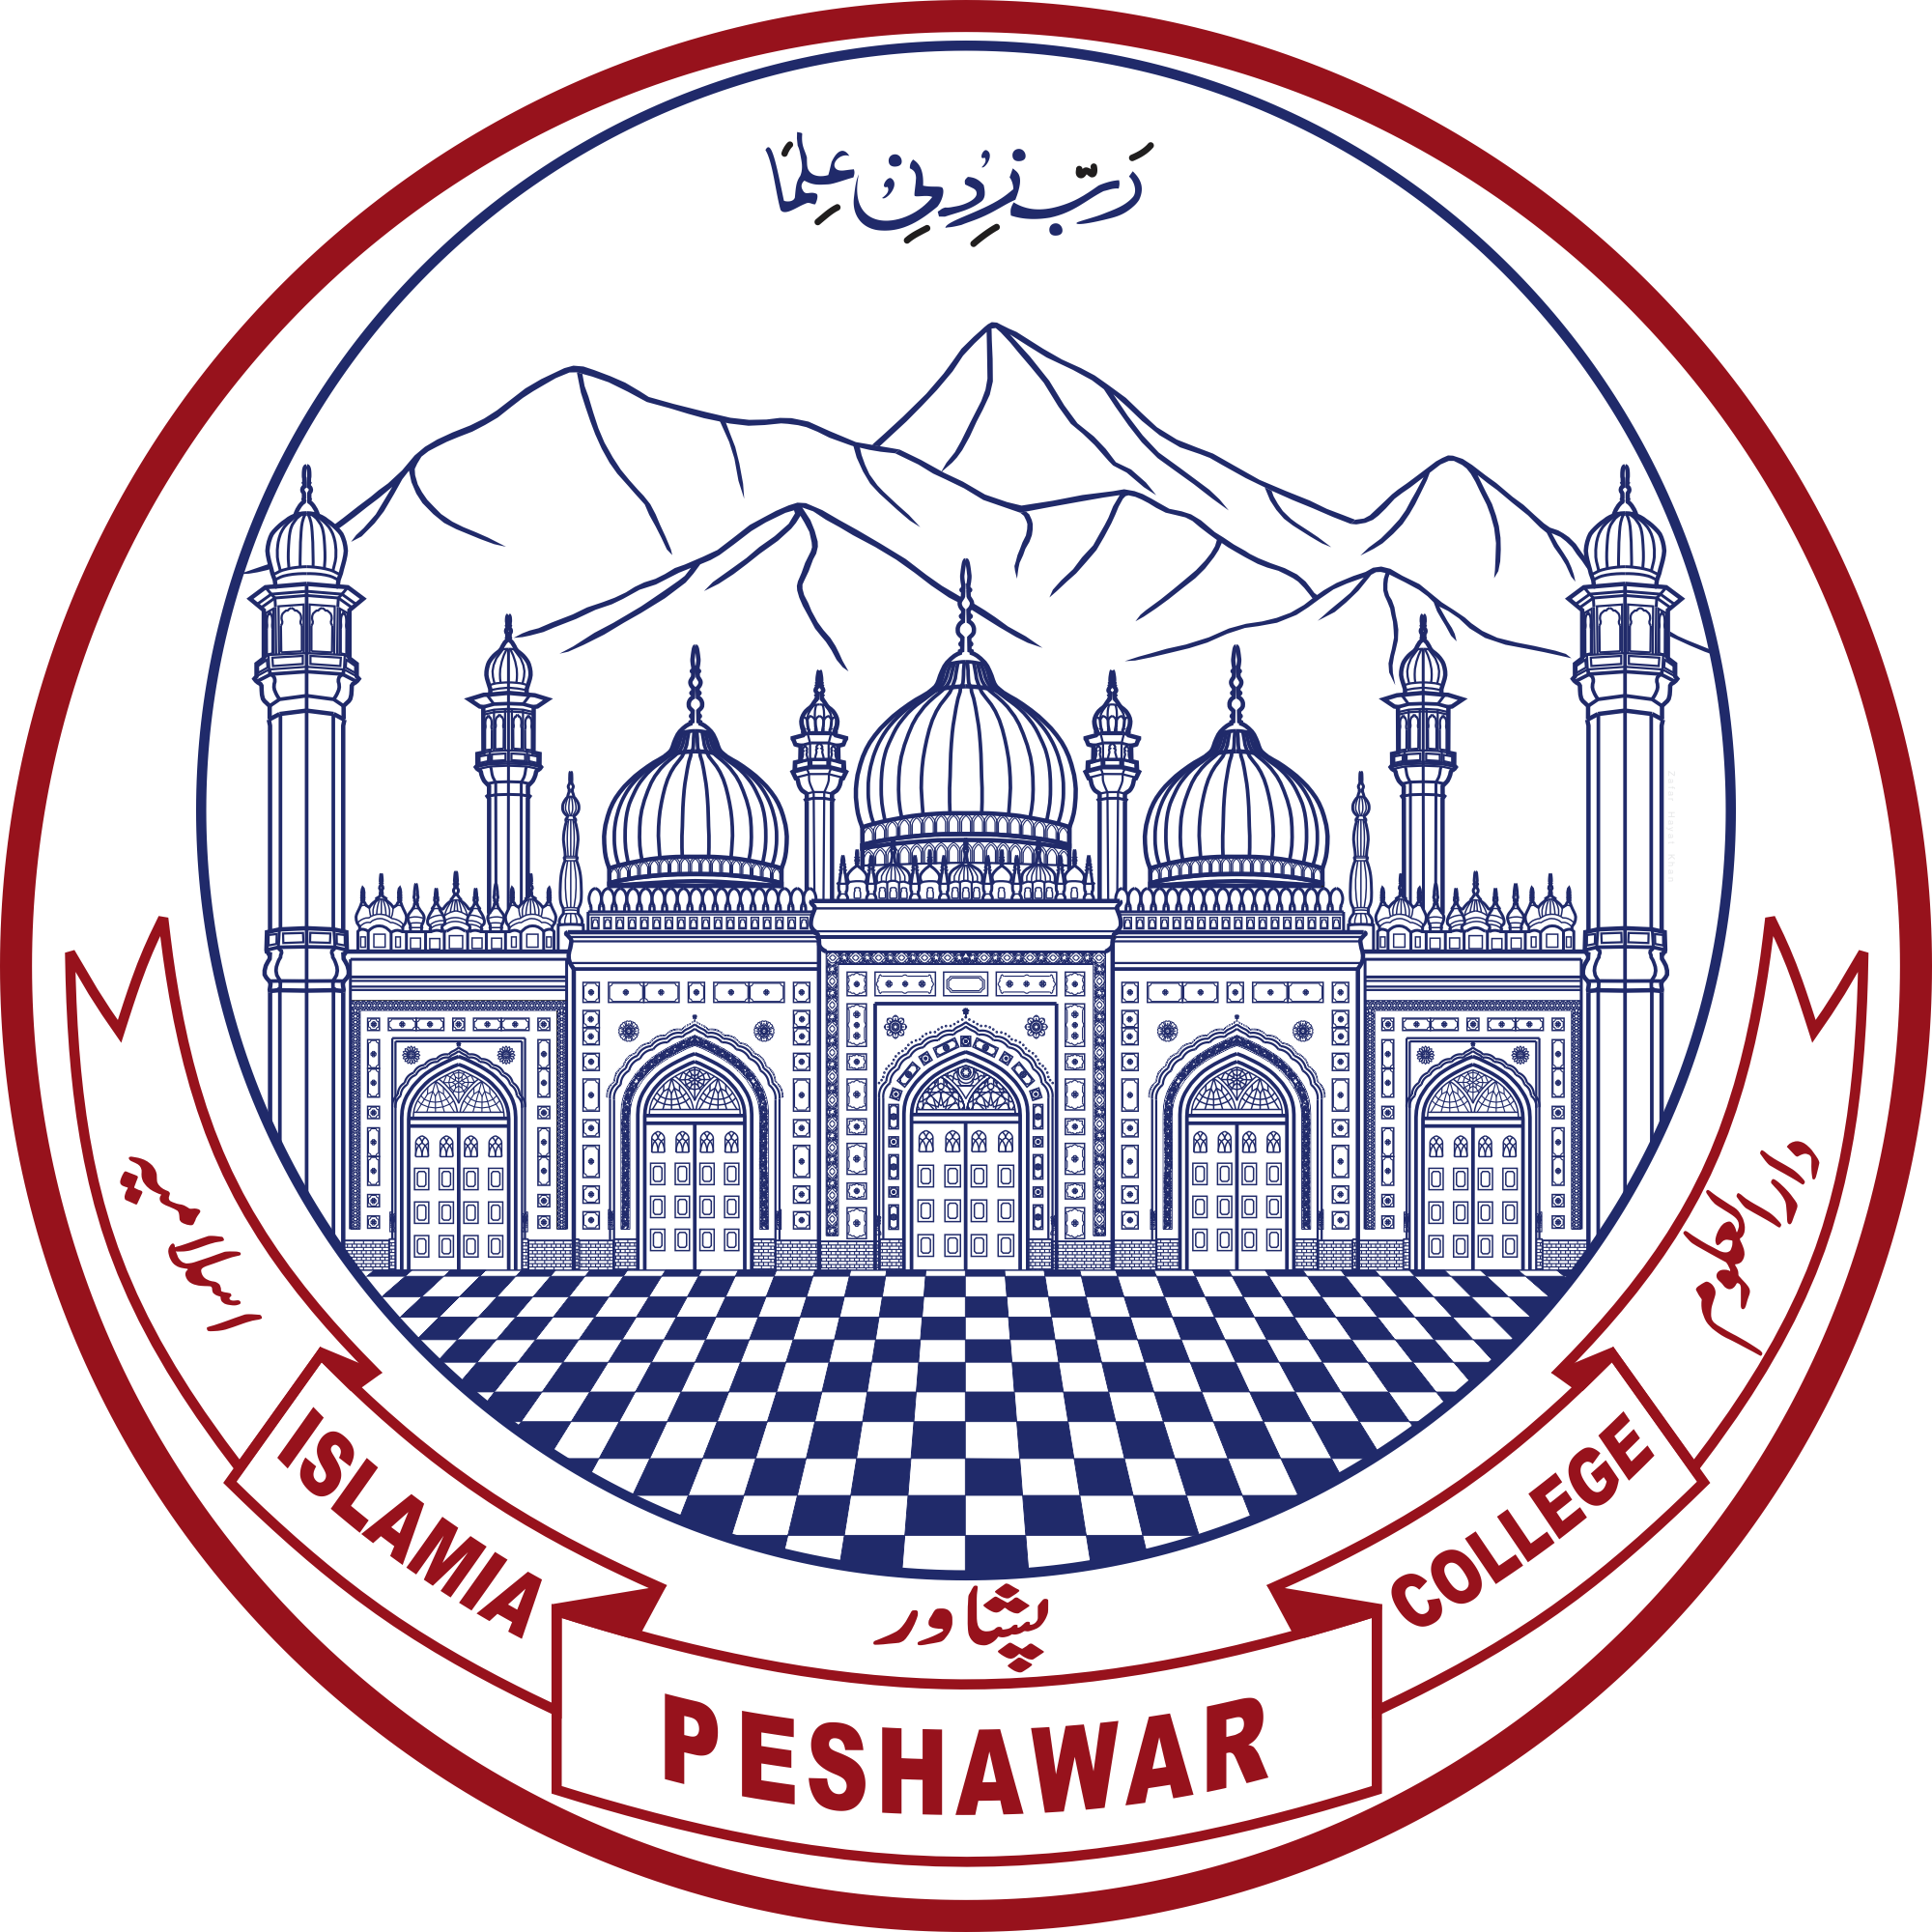 Islamia College Peshawar Bait-Ul-Mal Scholarship 2020-21